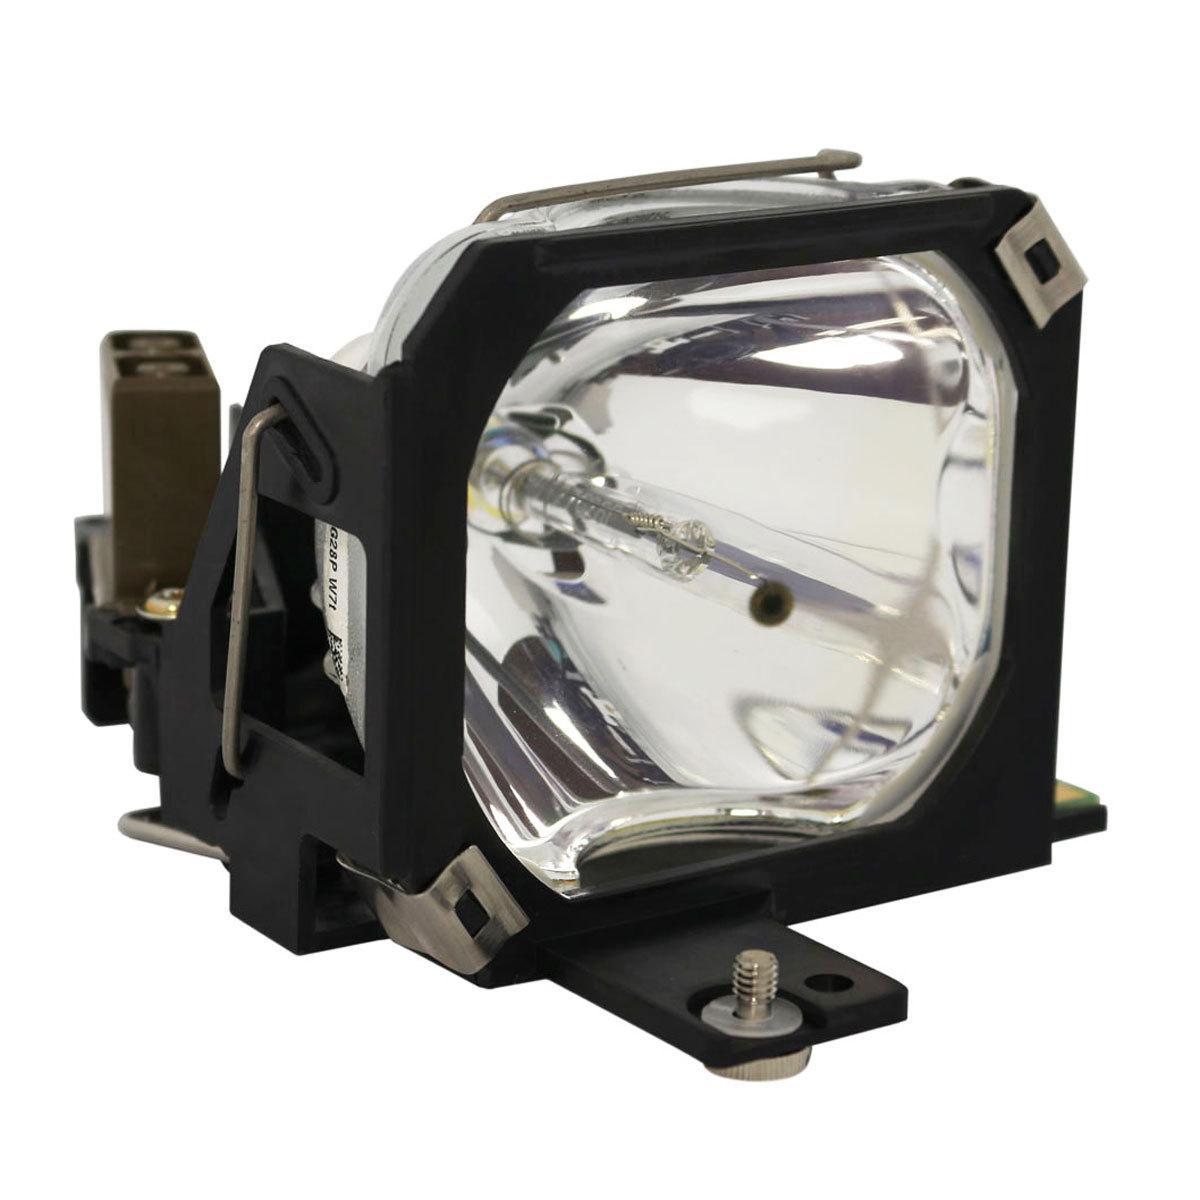 Geha 60-244793 Osram Projector Lamp Module - $111.00